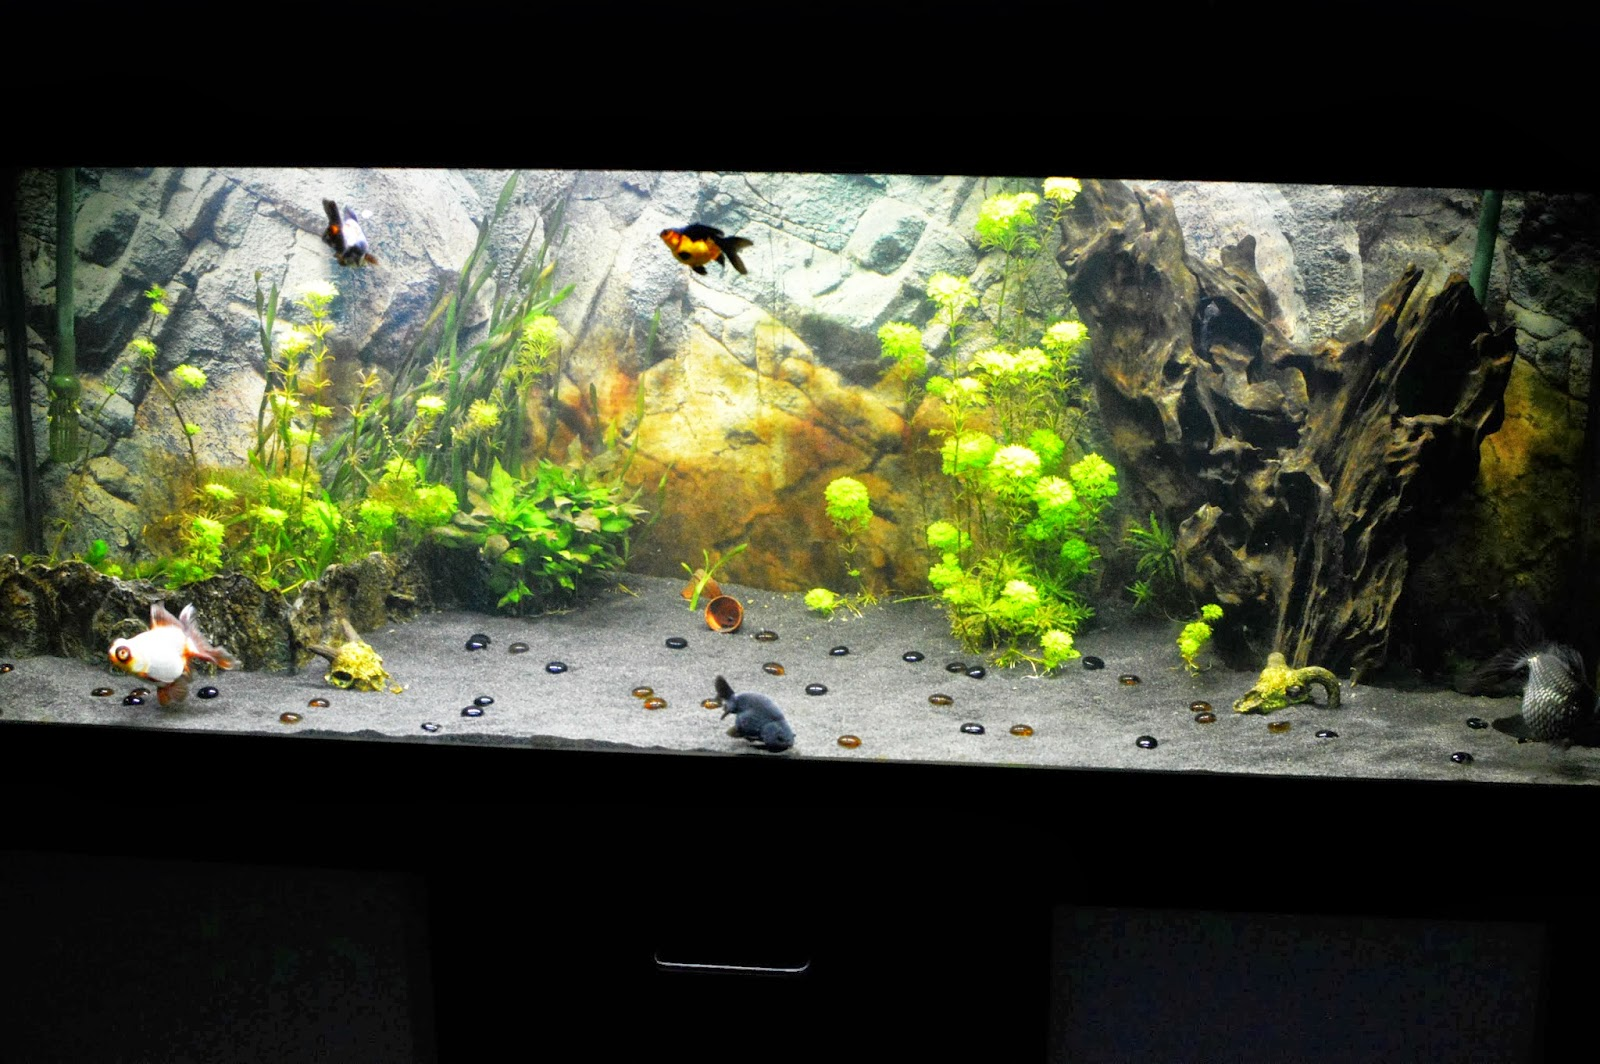 Misuzu 39 s fancy goldfish halloween tank 13 for Fancy fish tanks